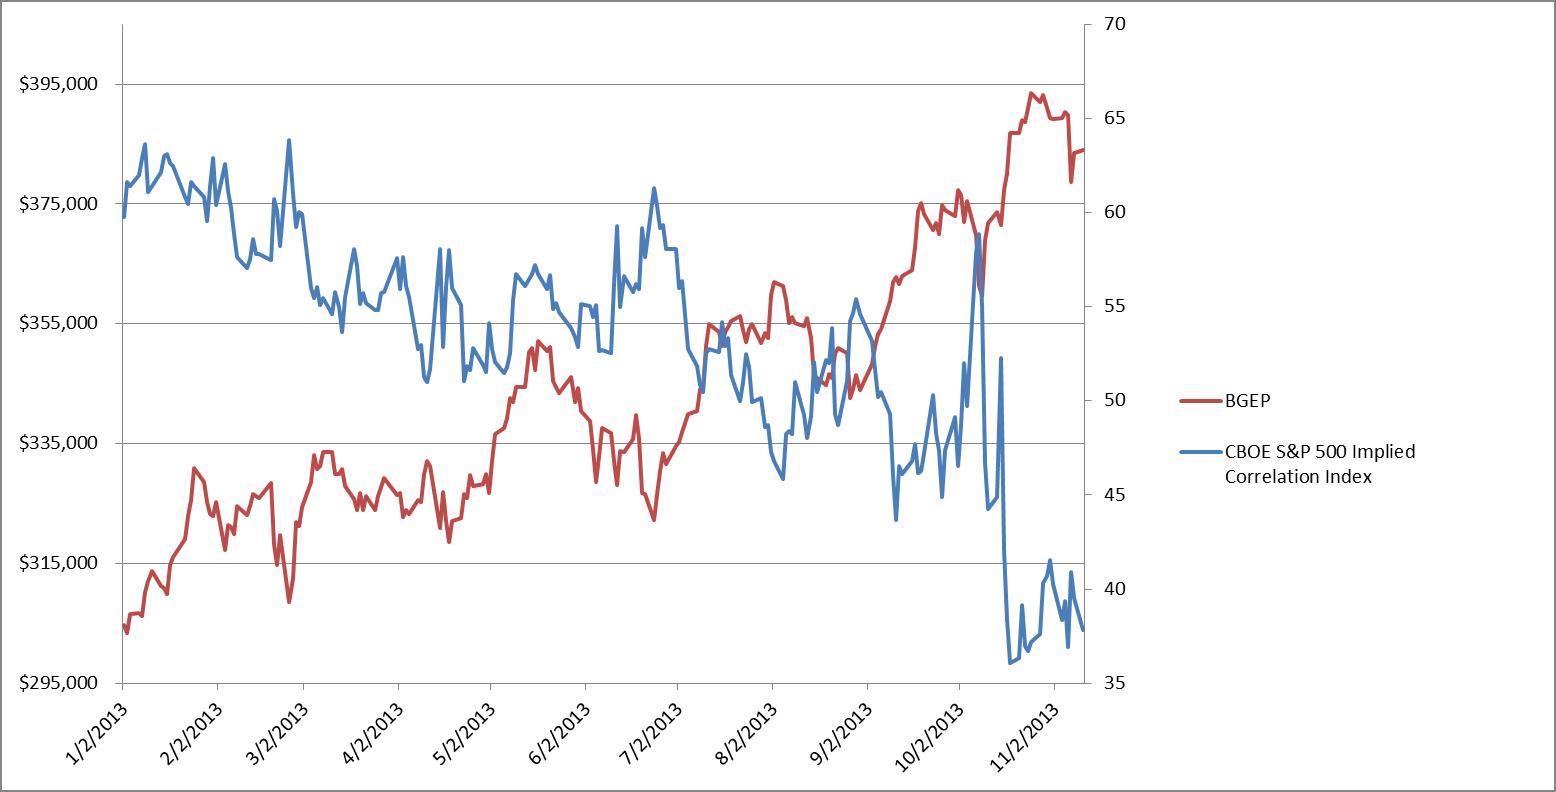 bgep and correlations